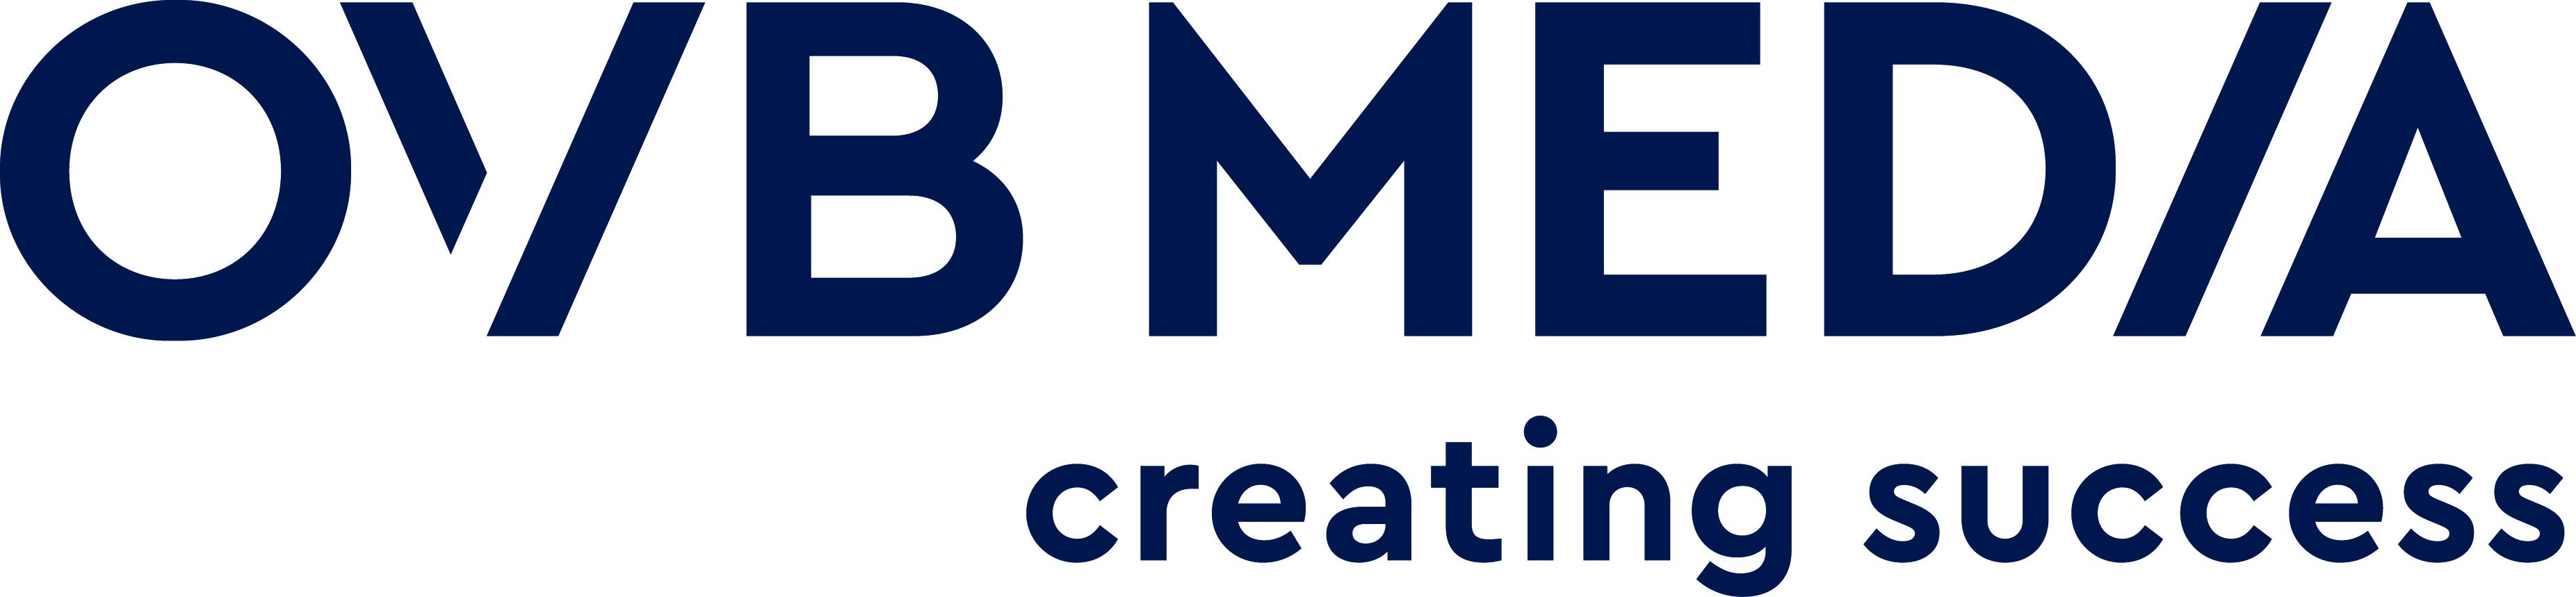 ovbmedia-logo_claim